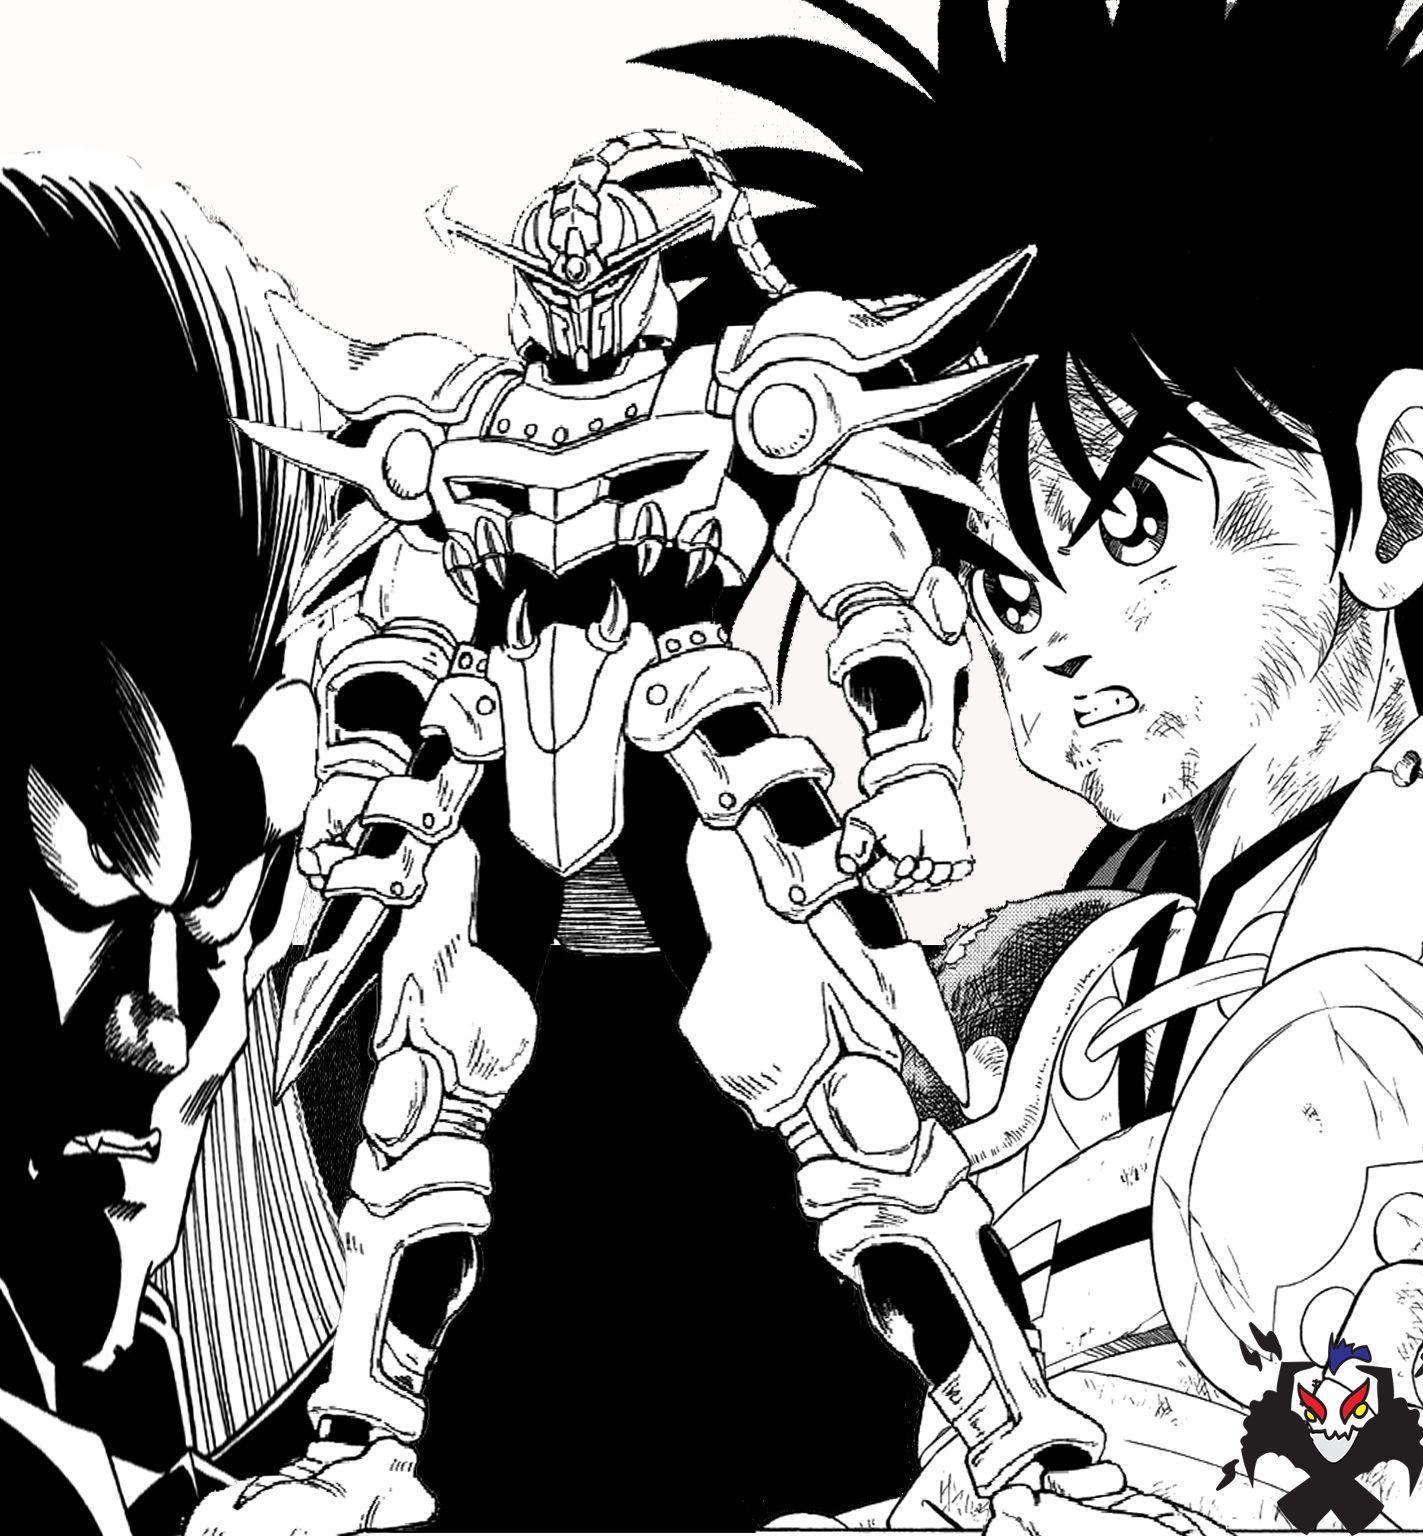 Dimana Download Anime: Dragon Quest Dai No Daibouken Film